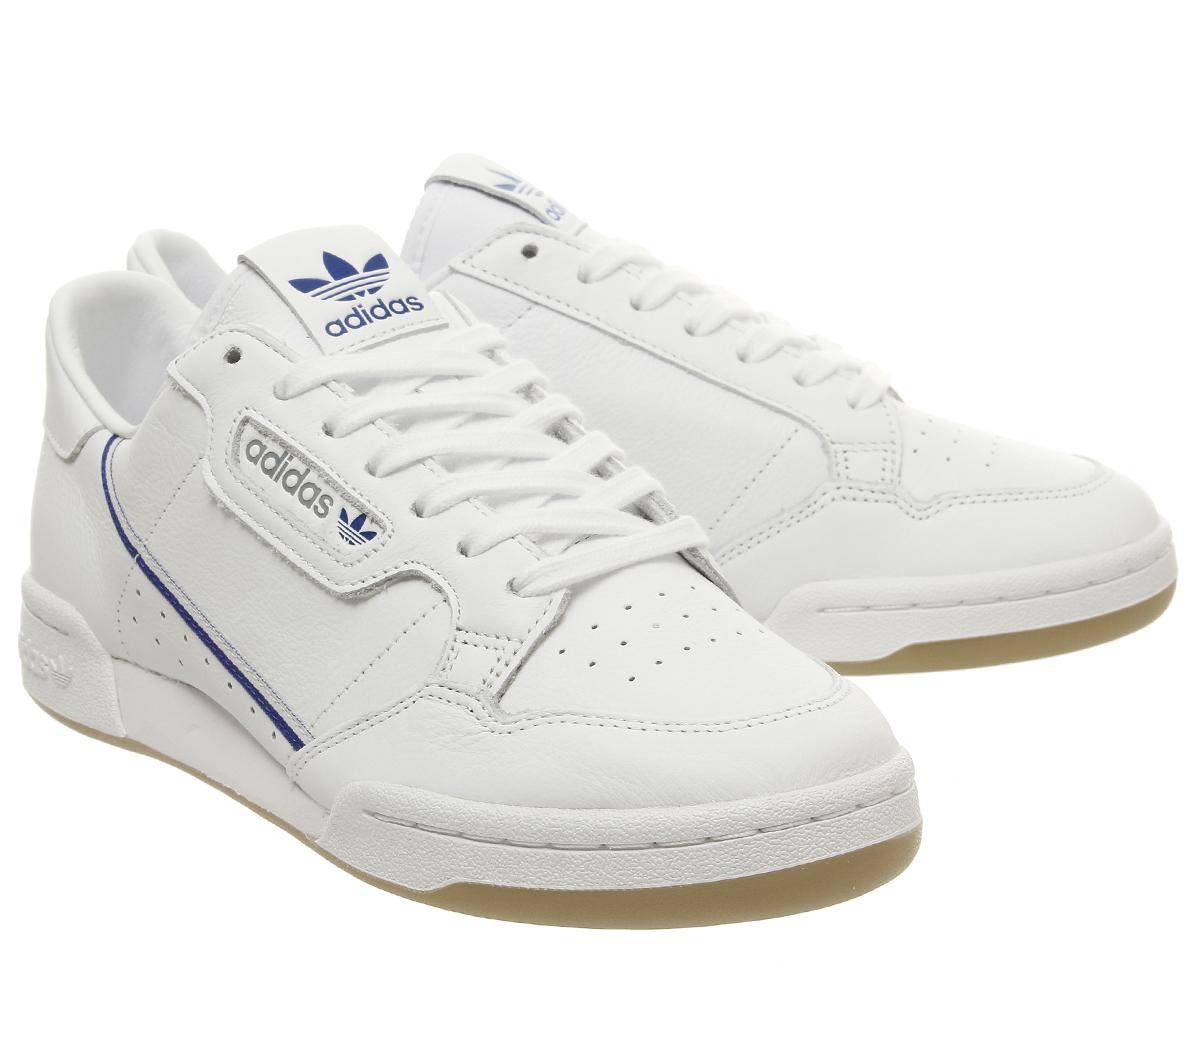 huge selection of 061b0 b4c1d SENTINEL Adidas continentale 80S formatori bianco grigio uno blu marino Gum  Tfl formatori scarpe